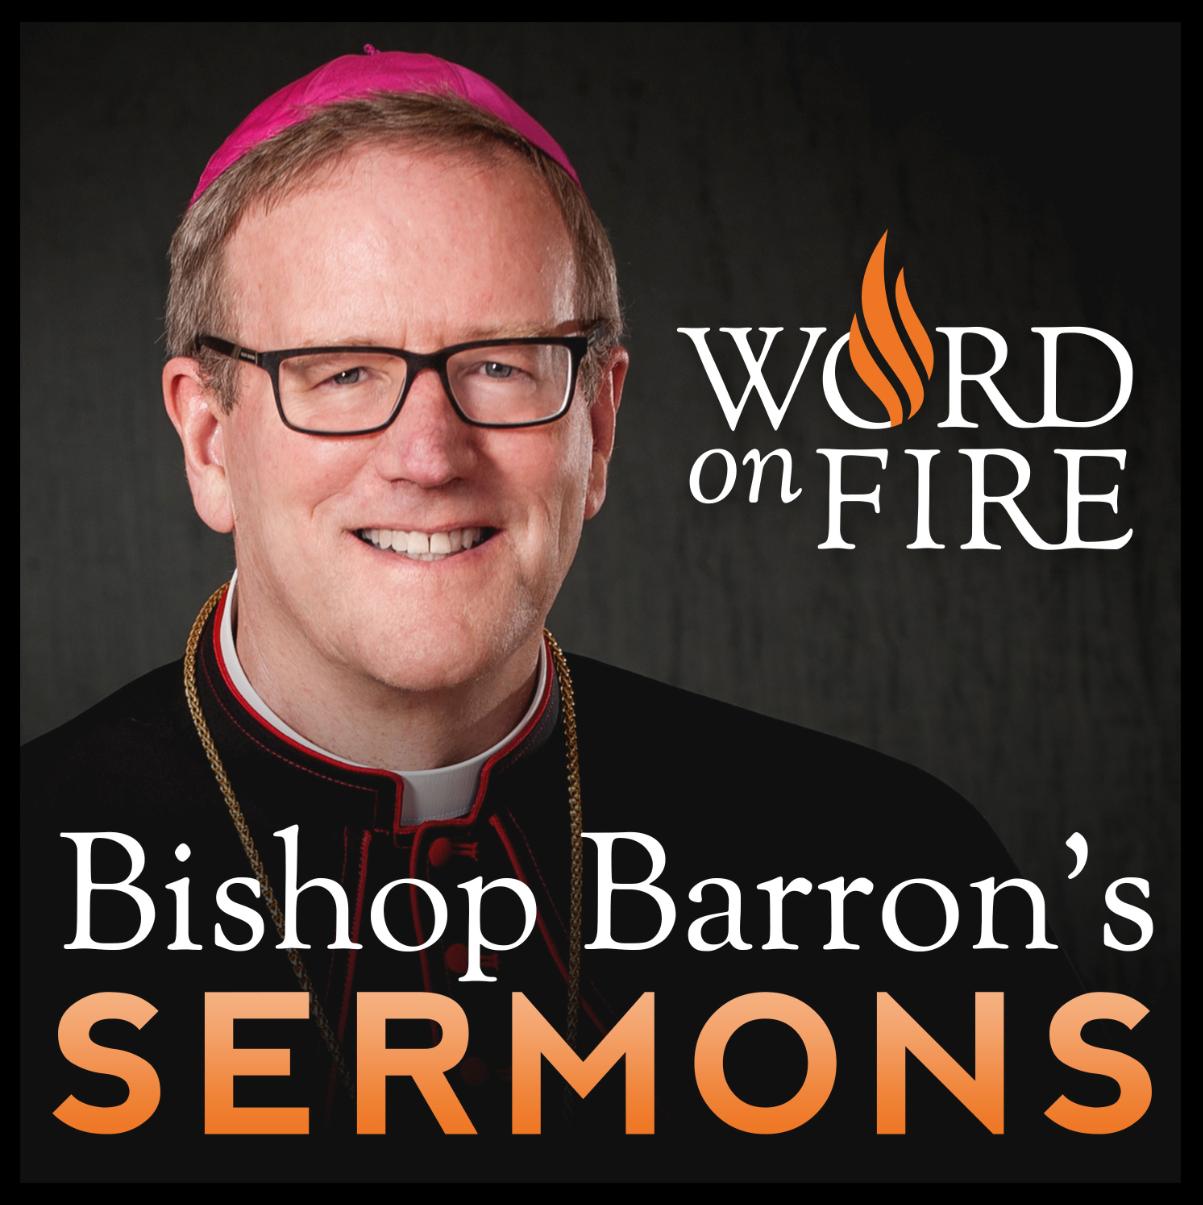 Bishop Robert Barron's Sermons